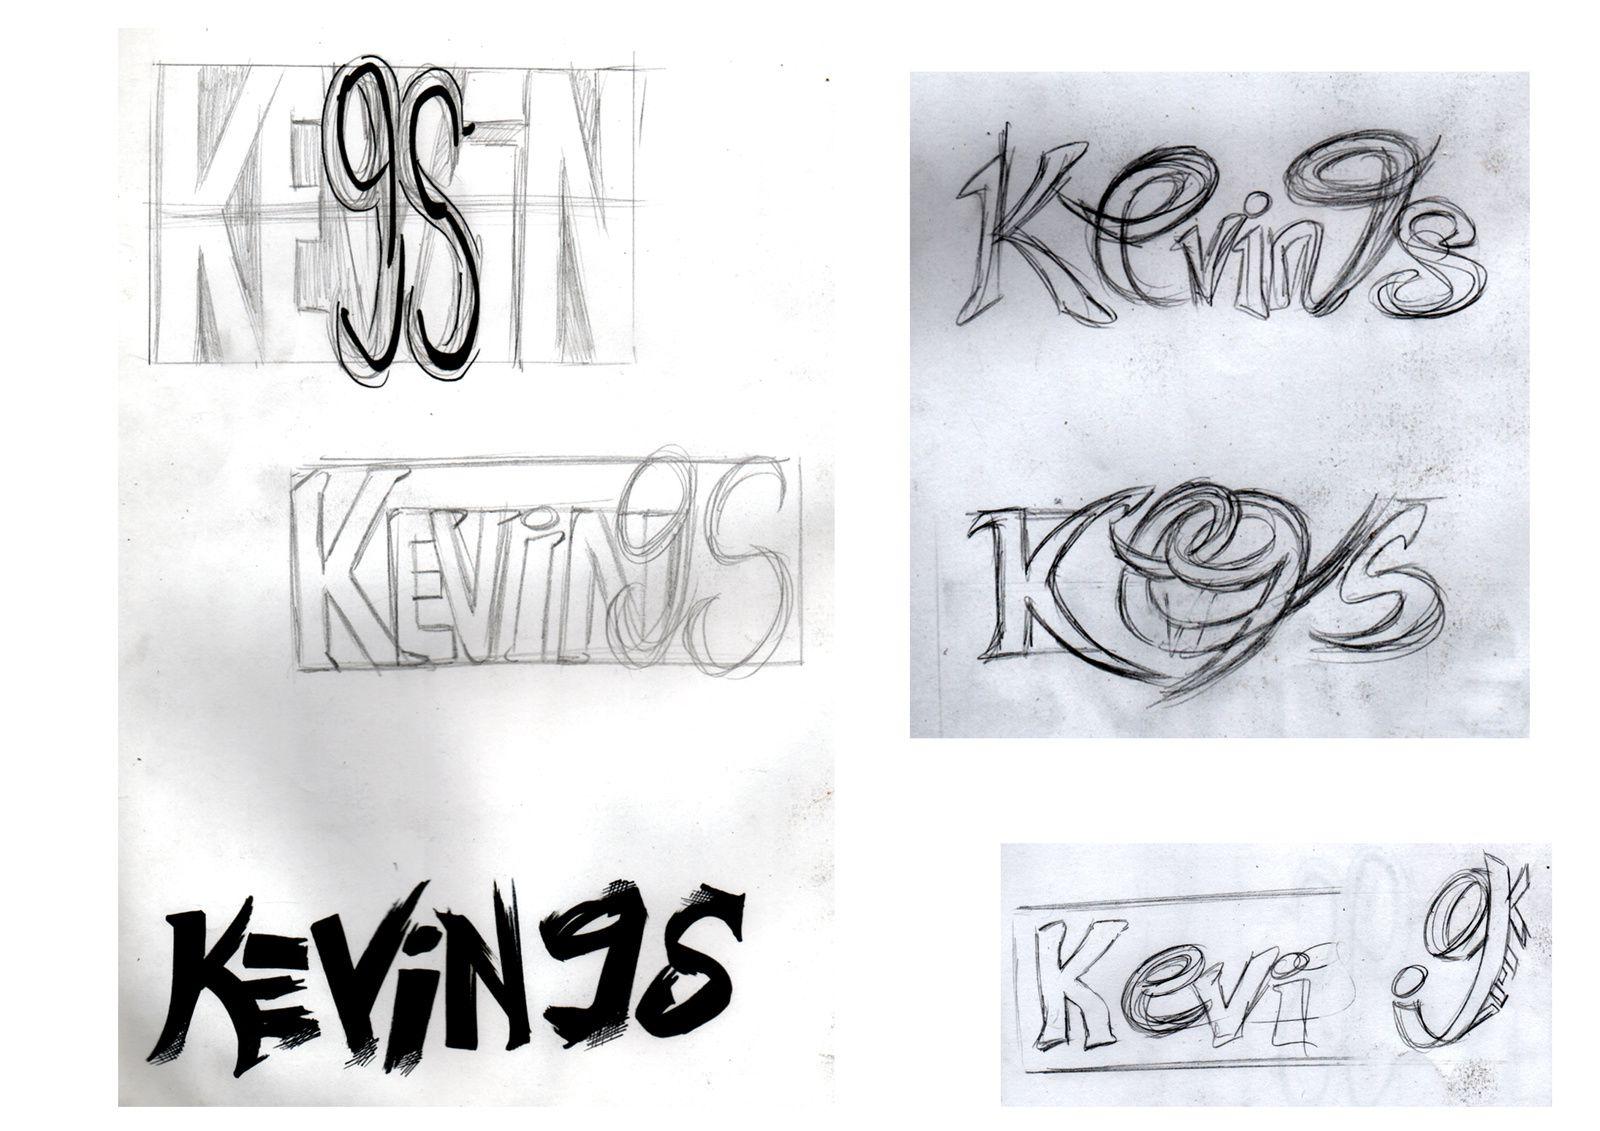 recherches logo kevin9s